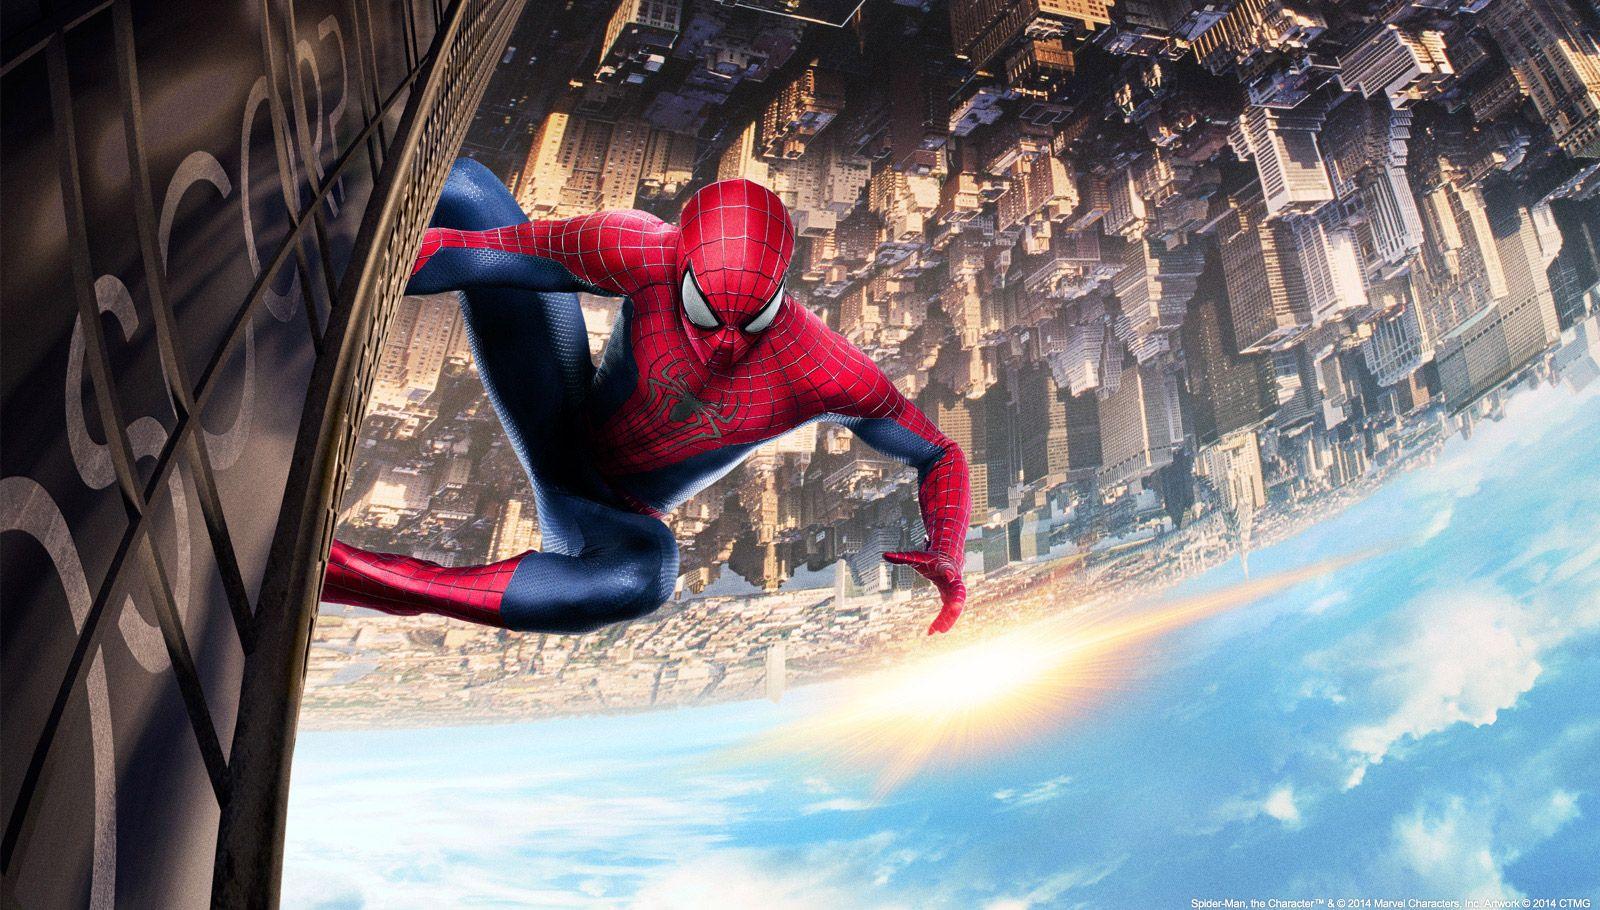 Hd wallpaper spiderman - The Amazing Spider Man Hd Desktop Wallpaper High Definition